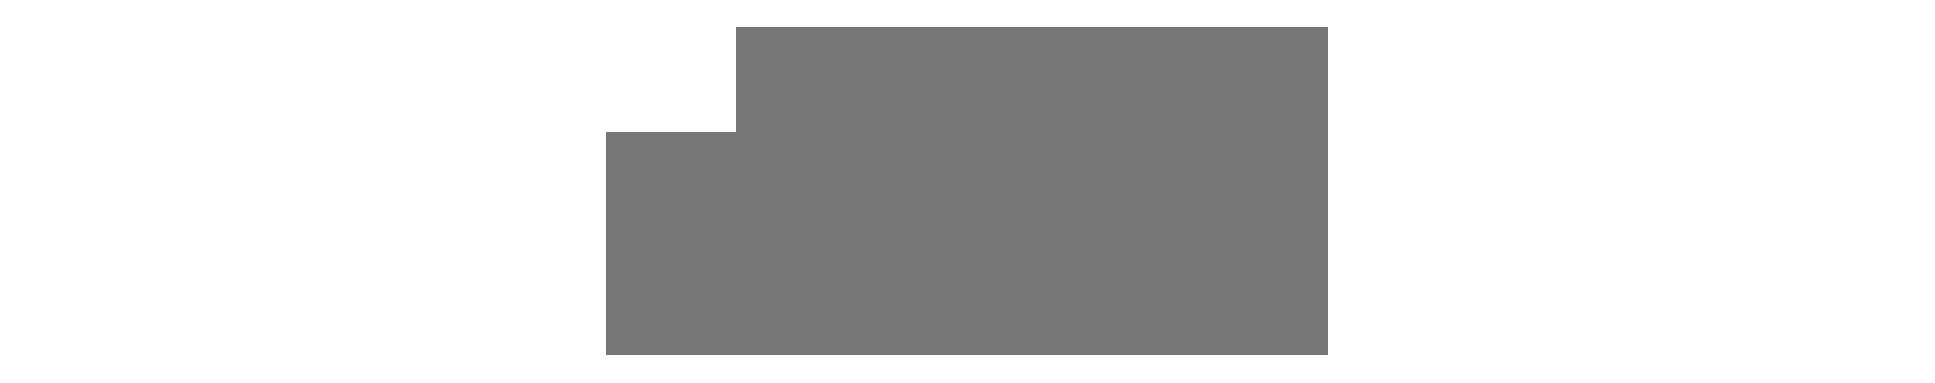 adp-bw